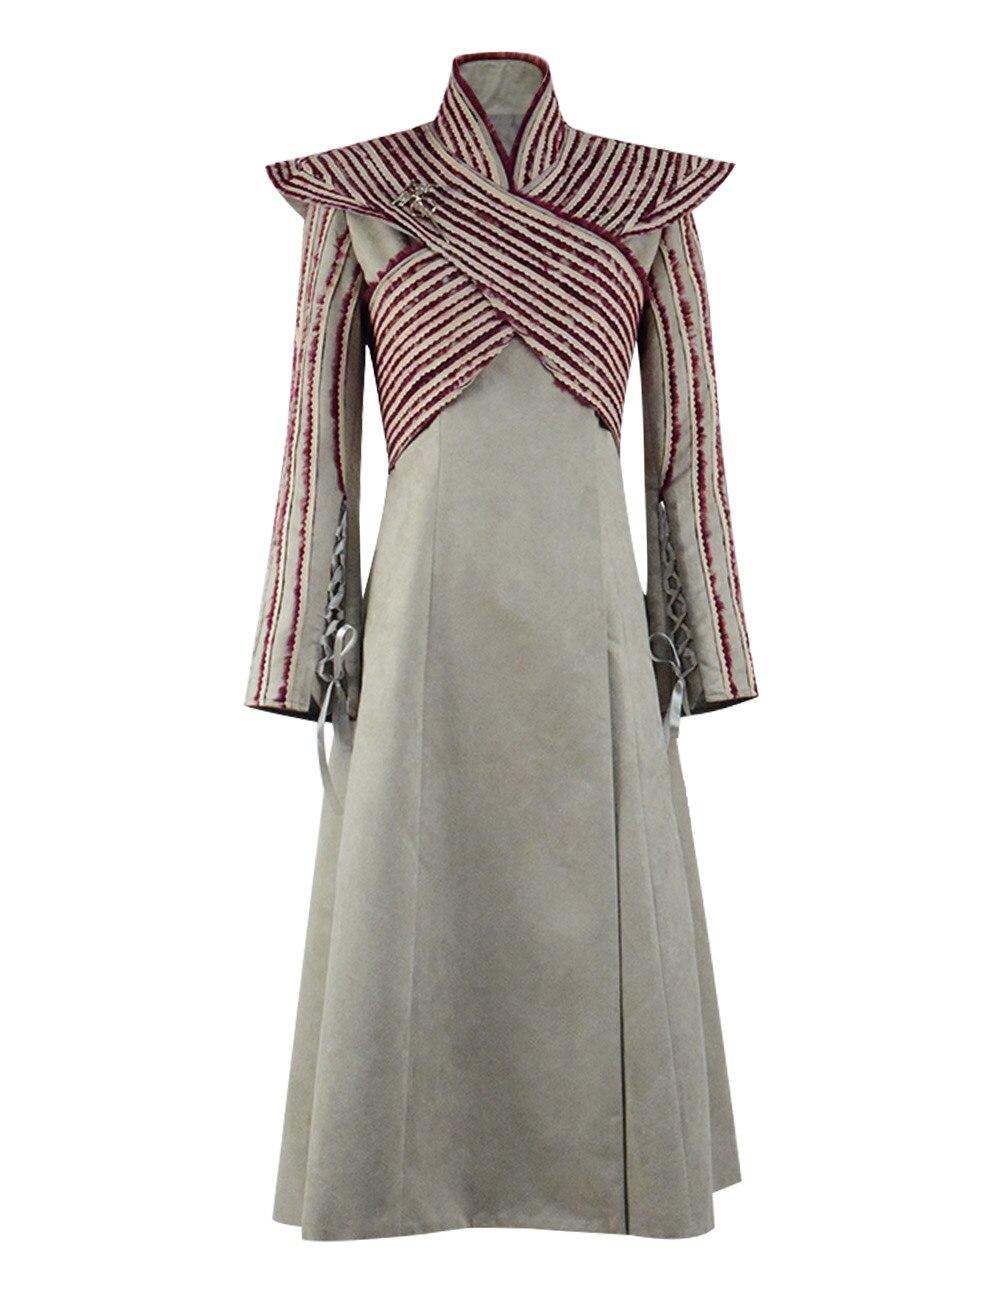 Daenerys Targaryen hiver Long manteau veste Cape reine Halloween Cosplay Costume